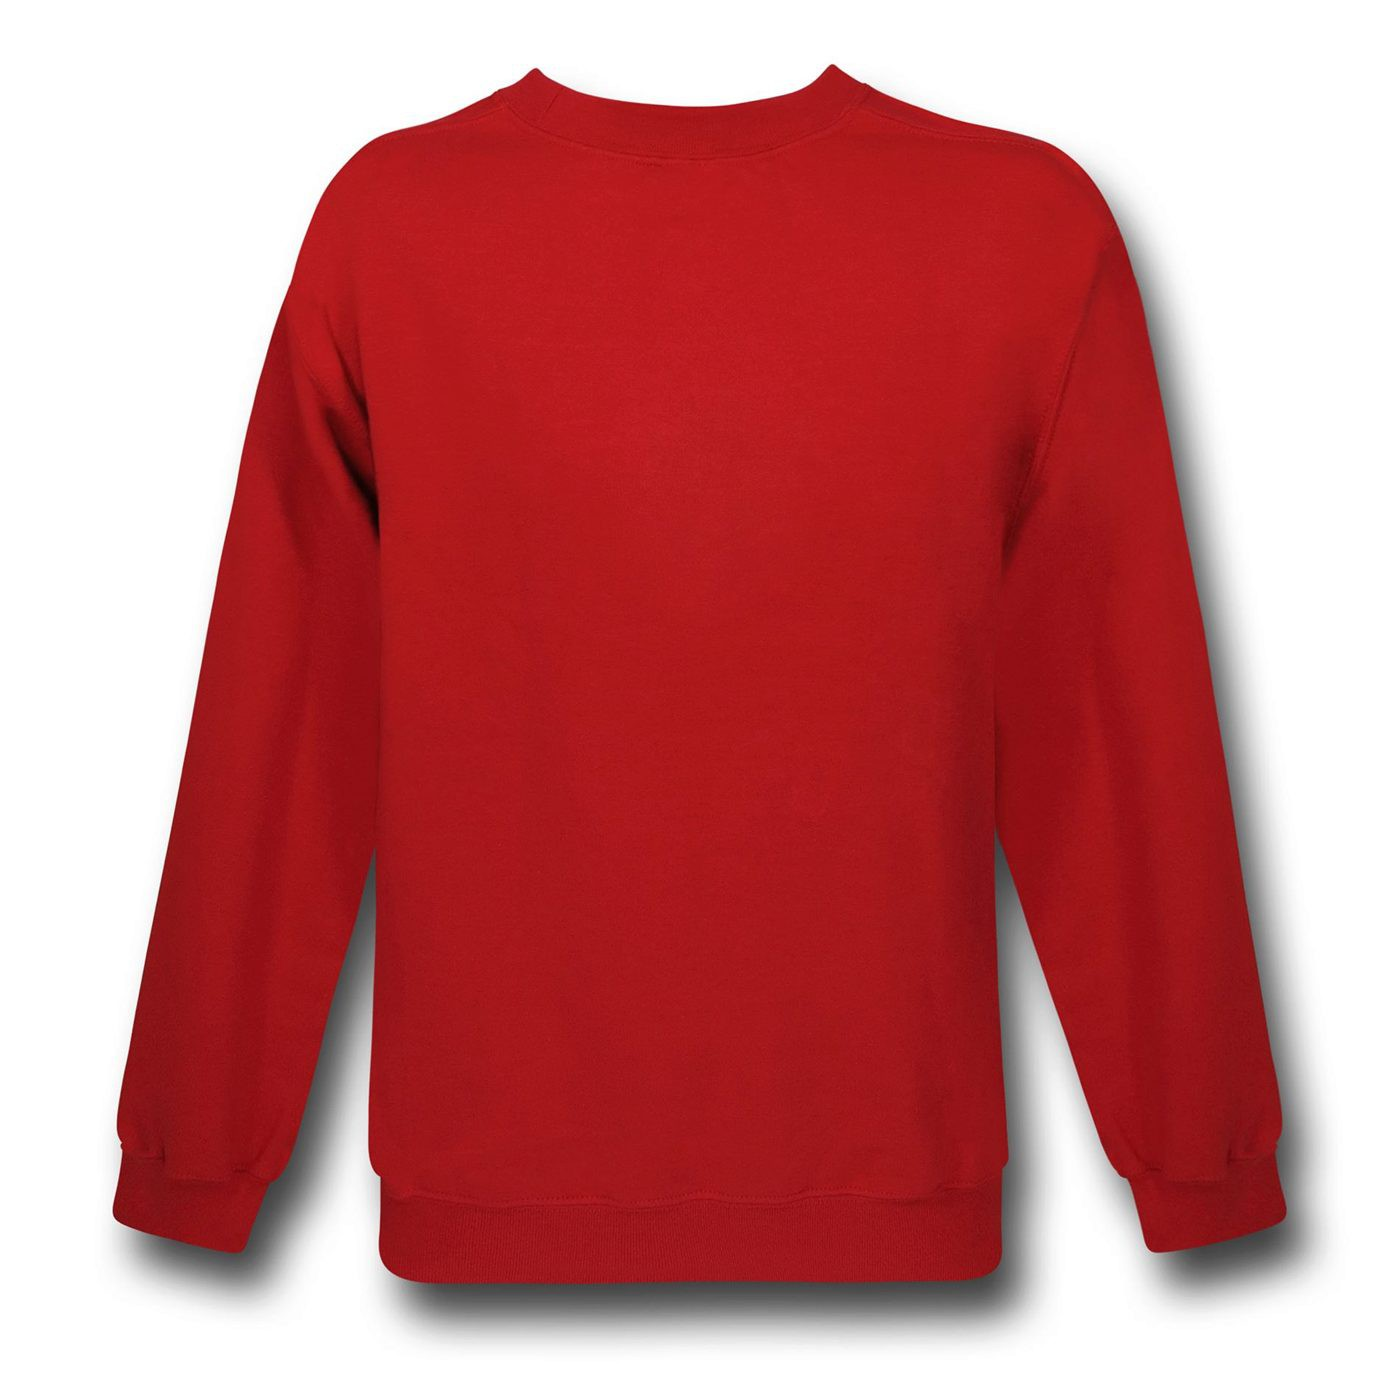 "TMNT Group Red ""Christmas Sweater"" Sweatshirt"